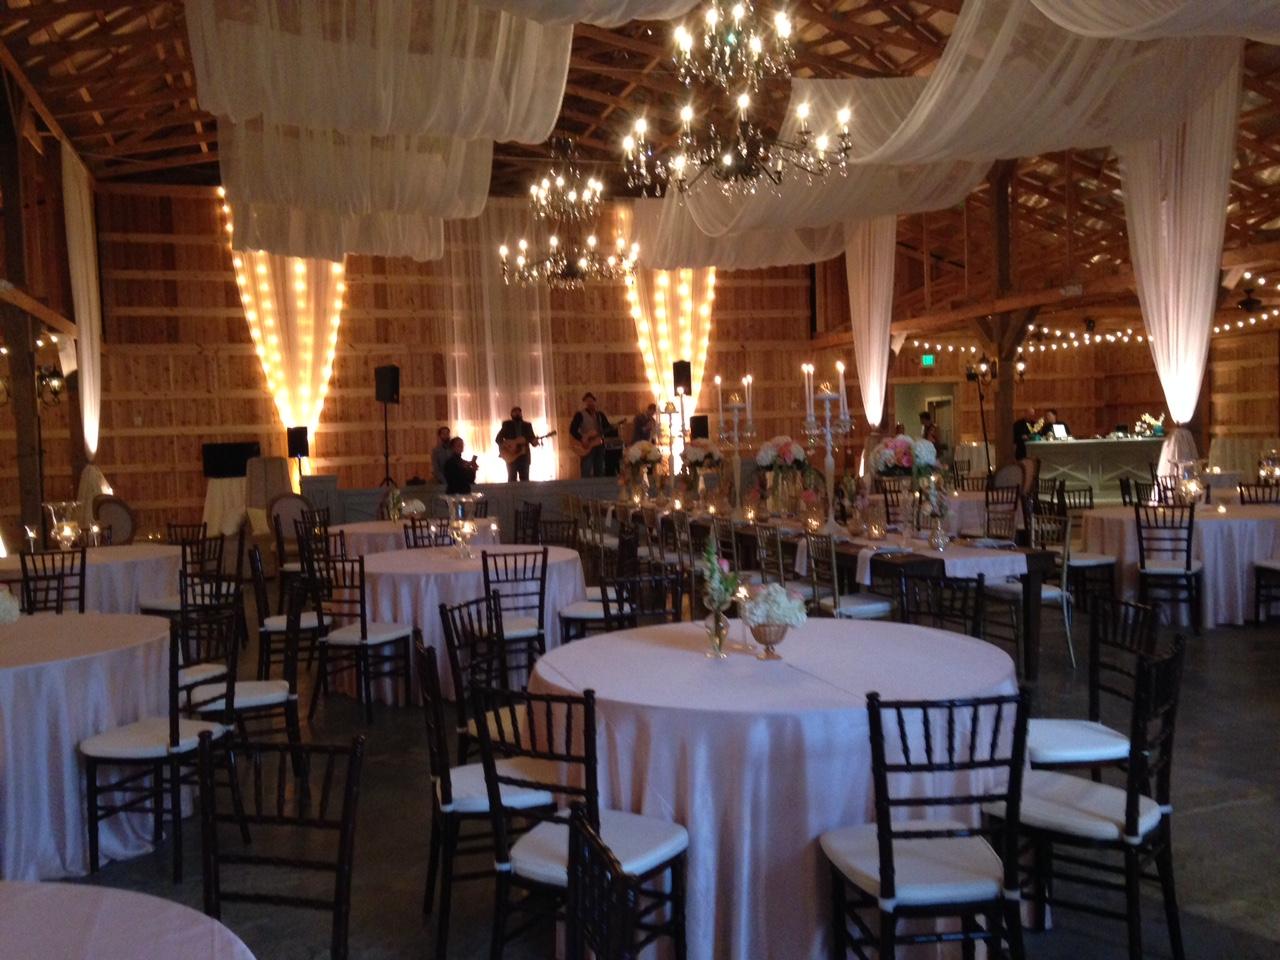 nashville-wedding-saddlewoodsfarm.jpg